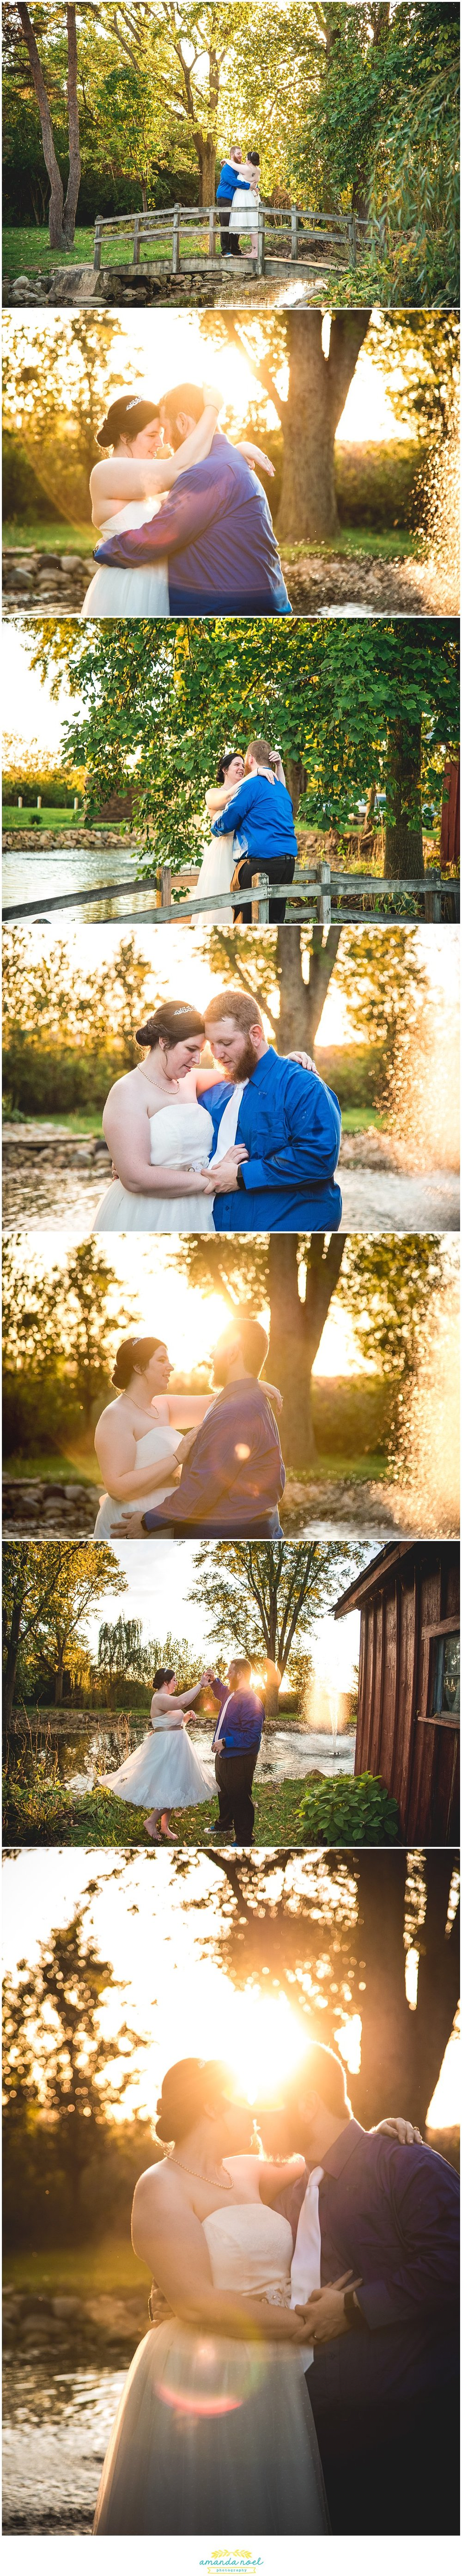 Dayton Ohio Wedding Photographer | Amanda Noel Photography